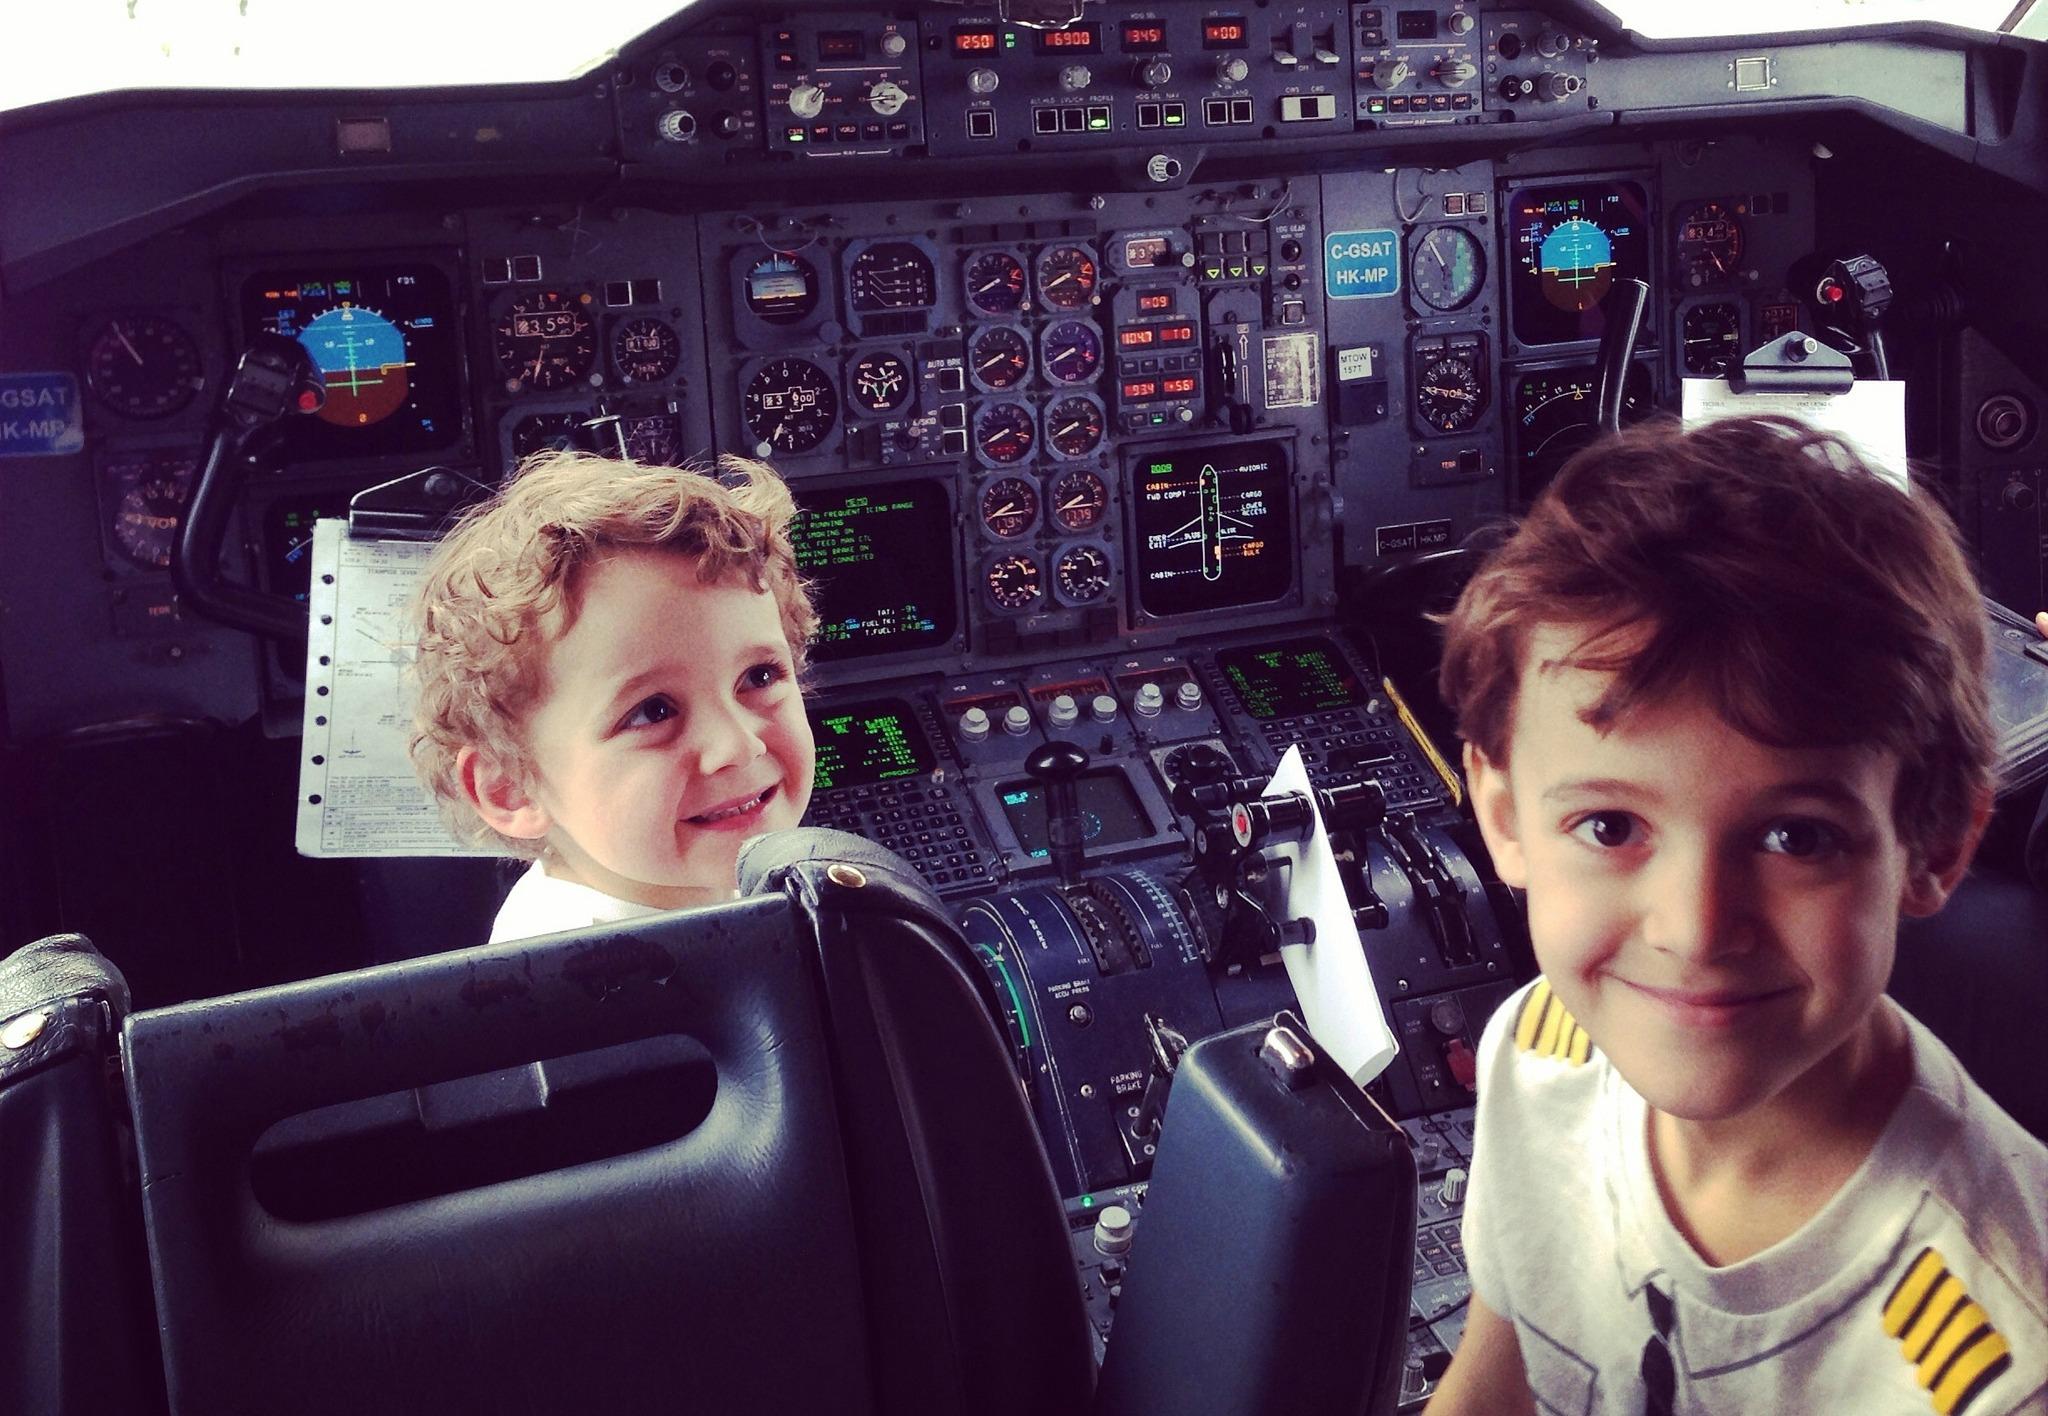 Zacharie Charlie on a Plane